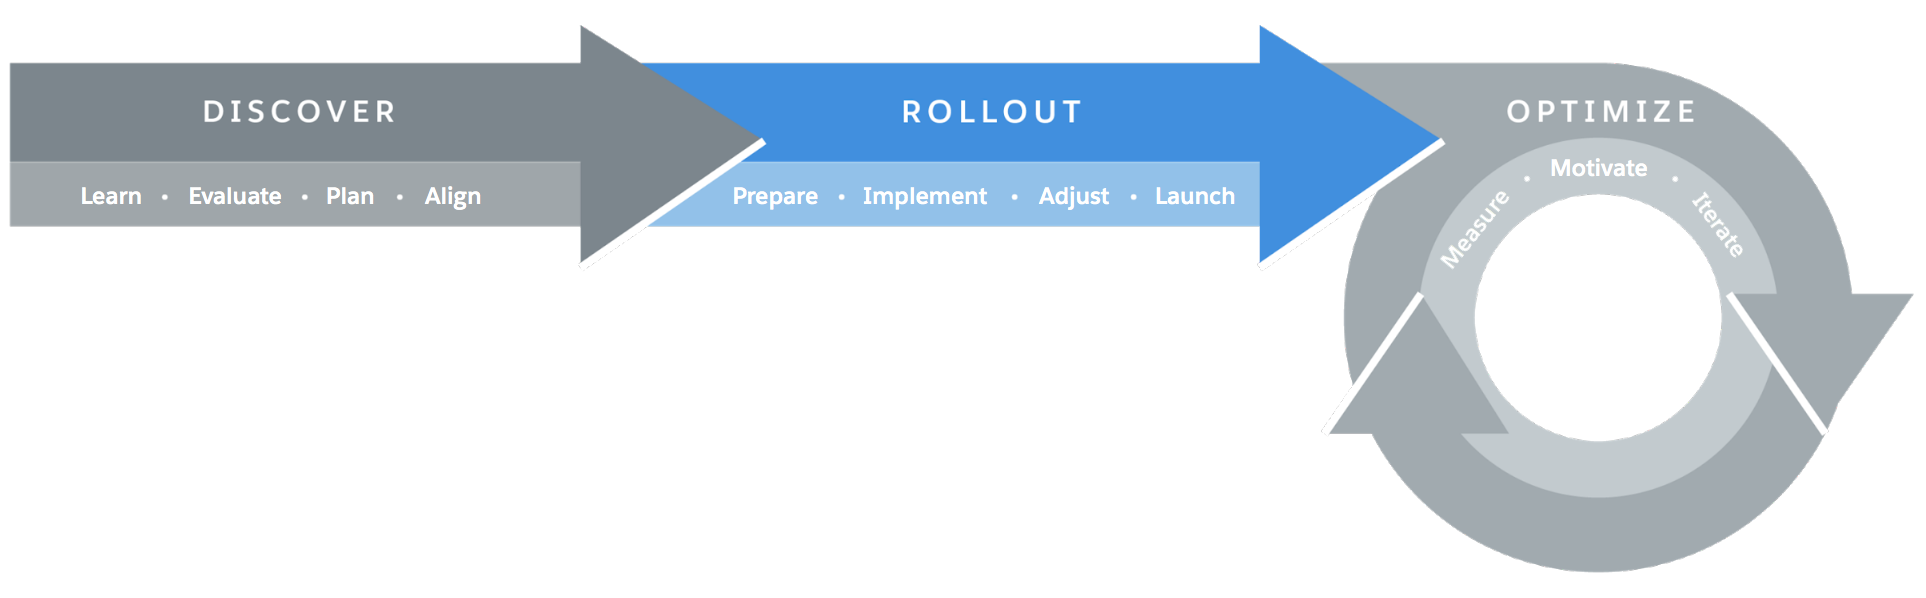 Lightning Experience の移行のフレームワークの視覚表示。ロールアウトフェーズが強調表示されています。